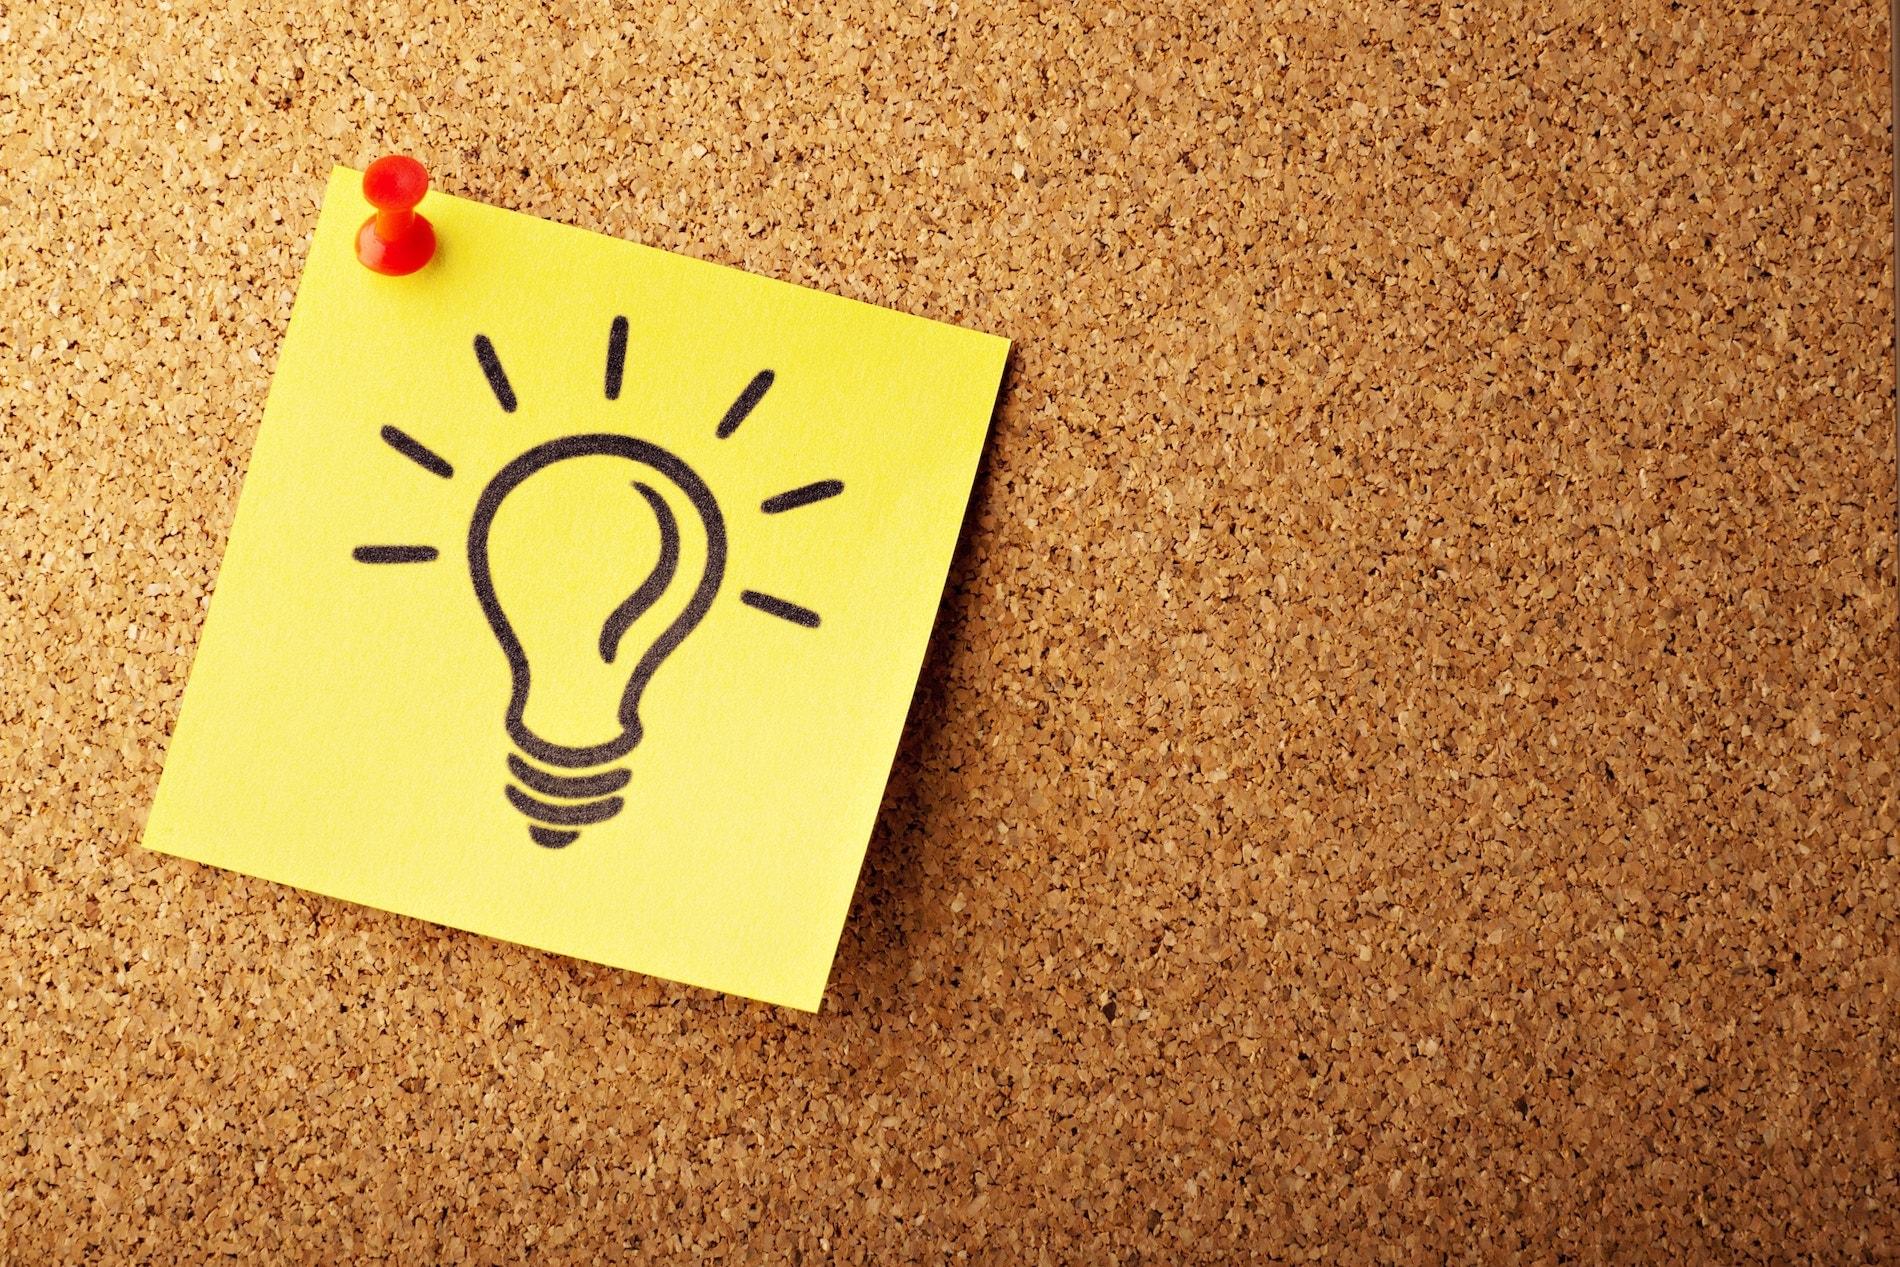 Lightbulb postage note